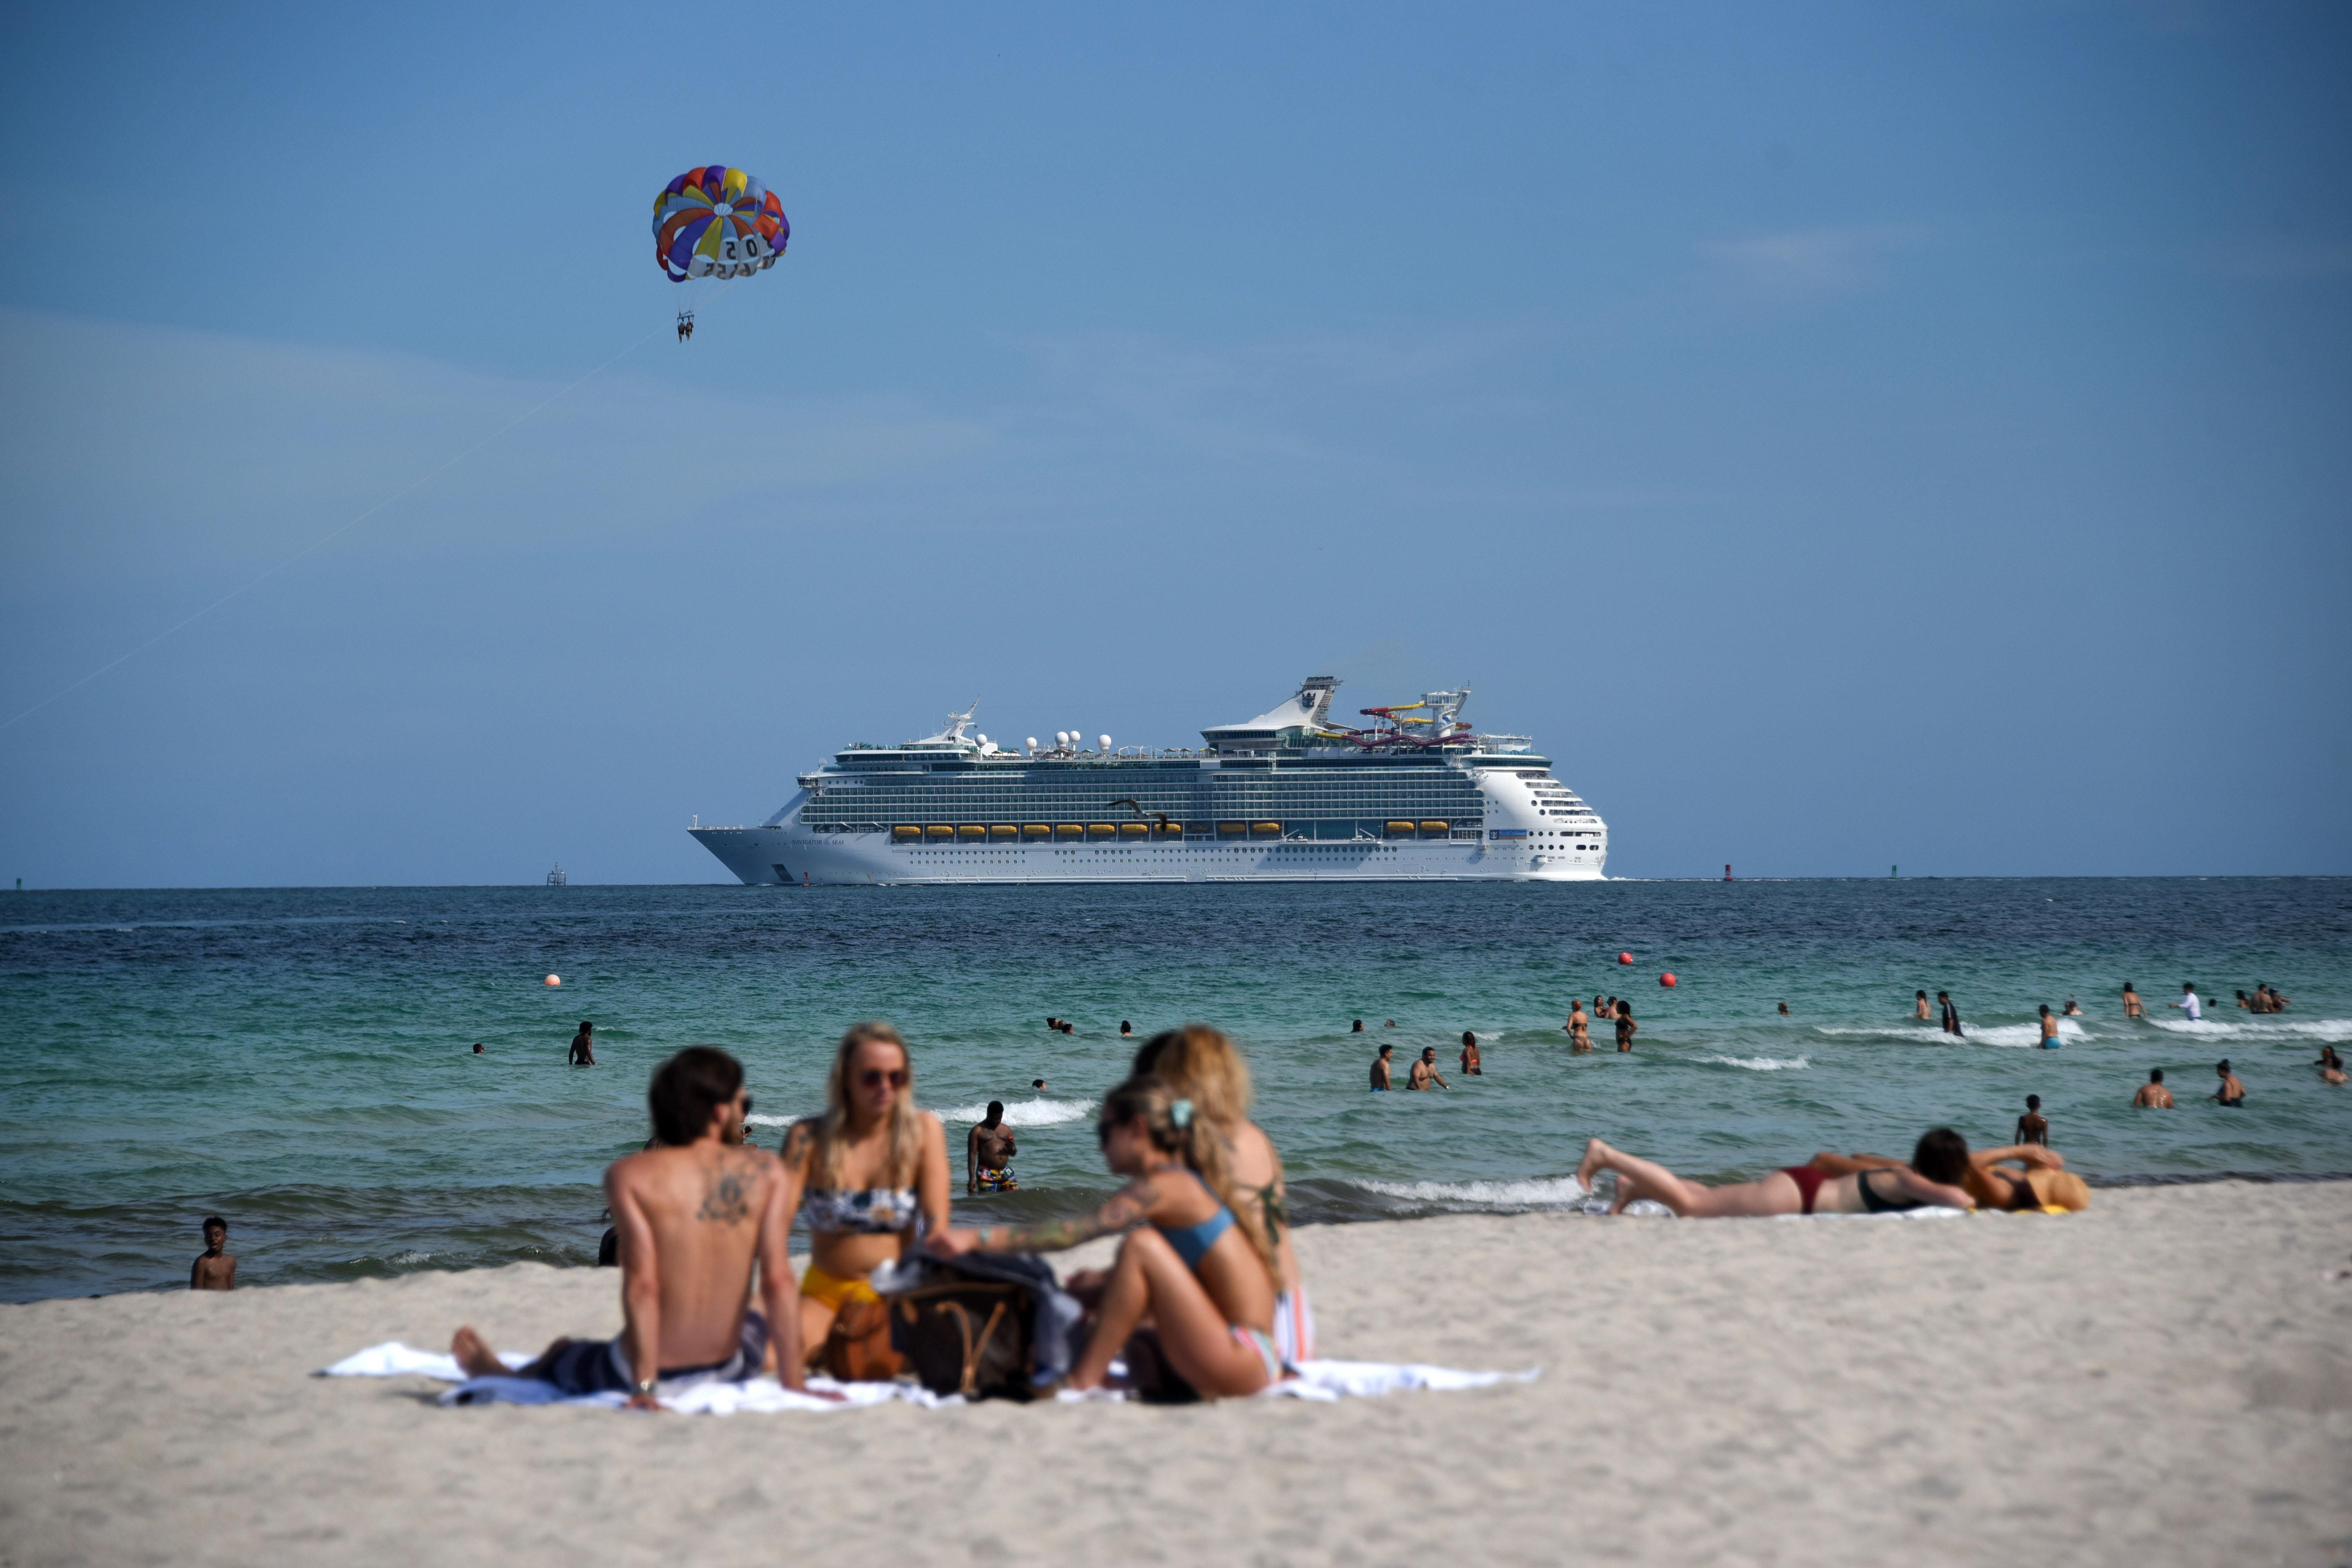 People visit Miami Beach, Florida, on June 22.